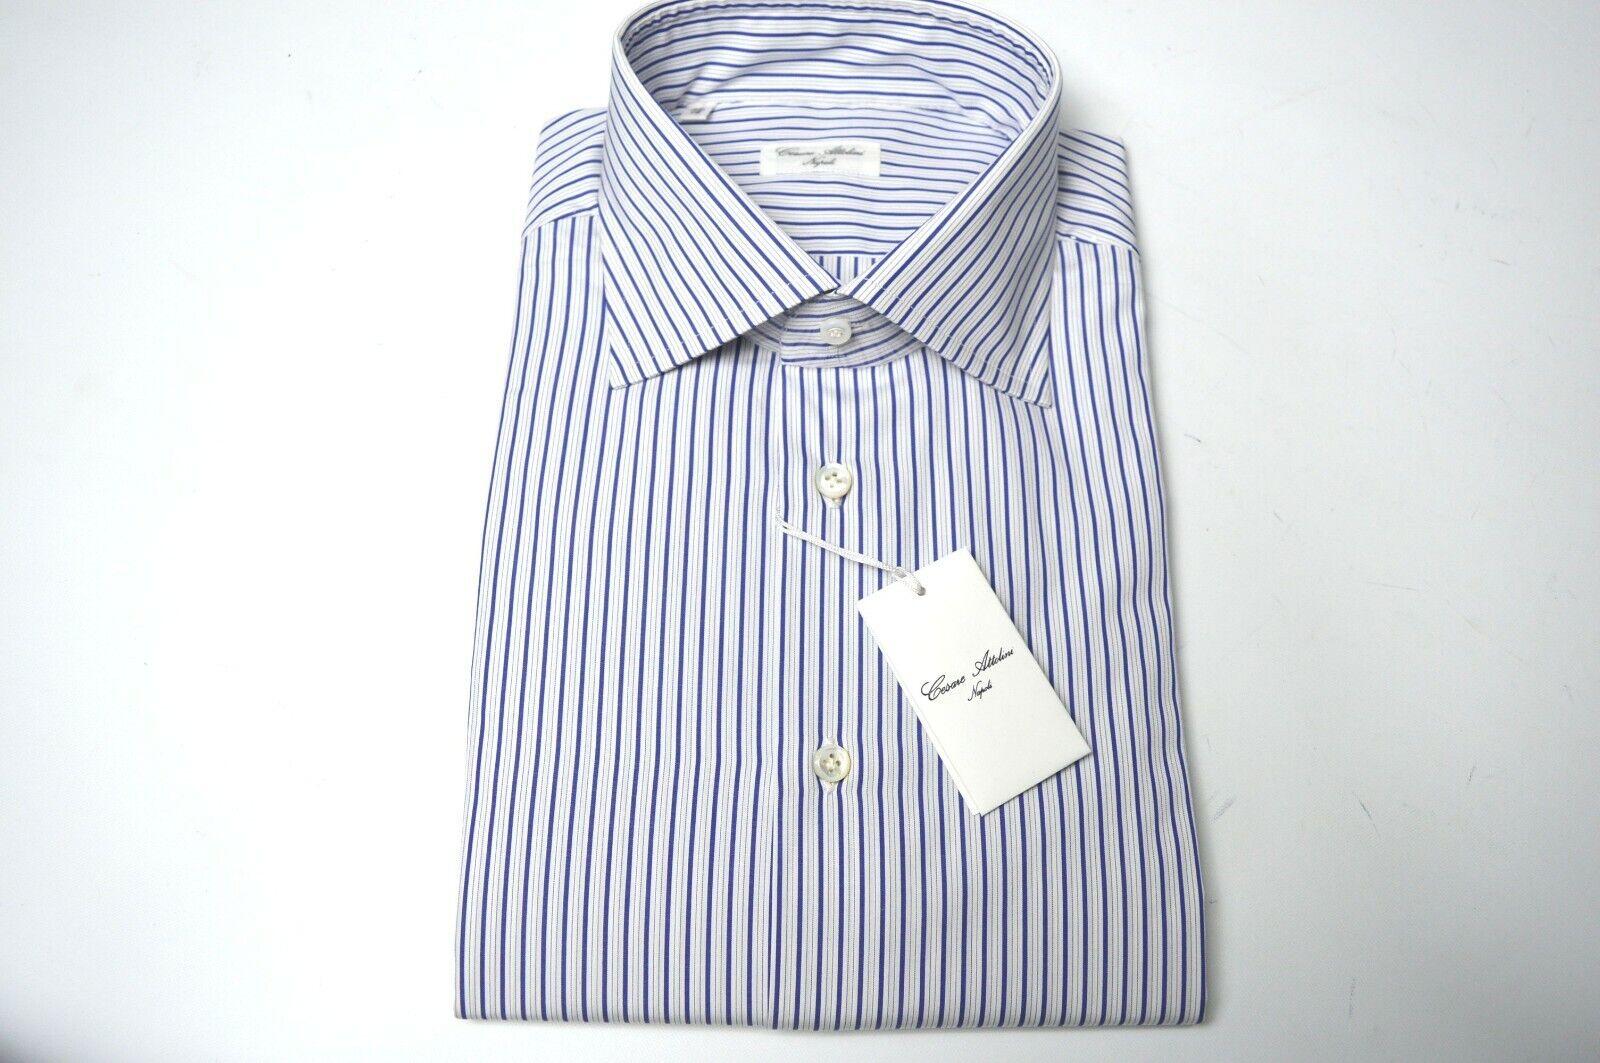 NEW CESARE ATTOLINI  Dress Shirt  Größe 17 Us 43 Eu (Cod AT15)